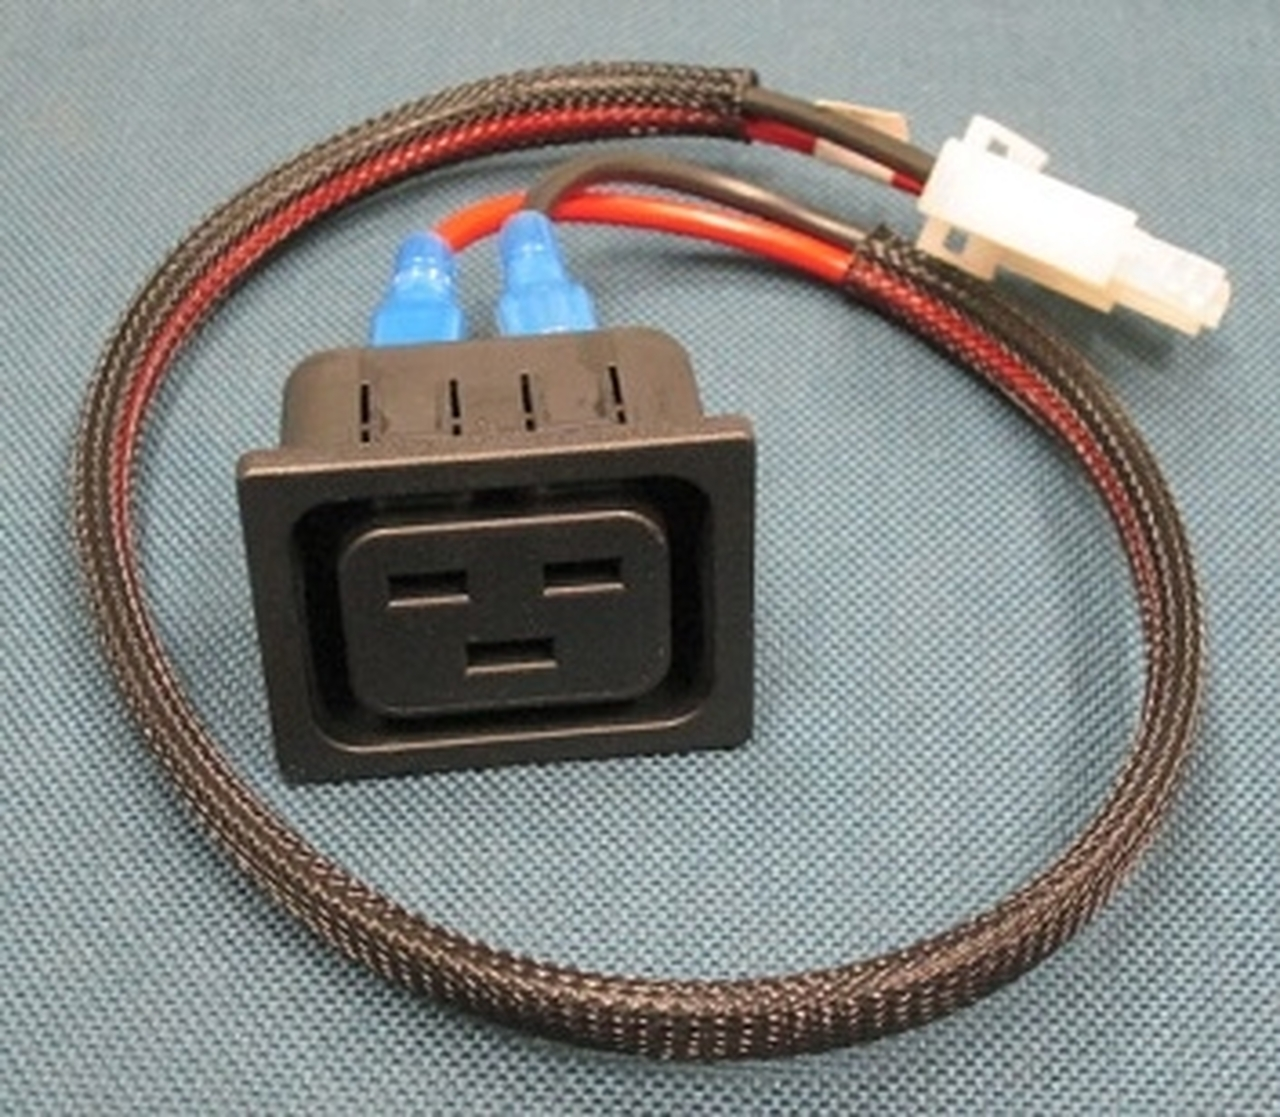 Battery Backup Wire Harness For Quadrafire Pellet Stoves